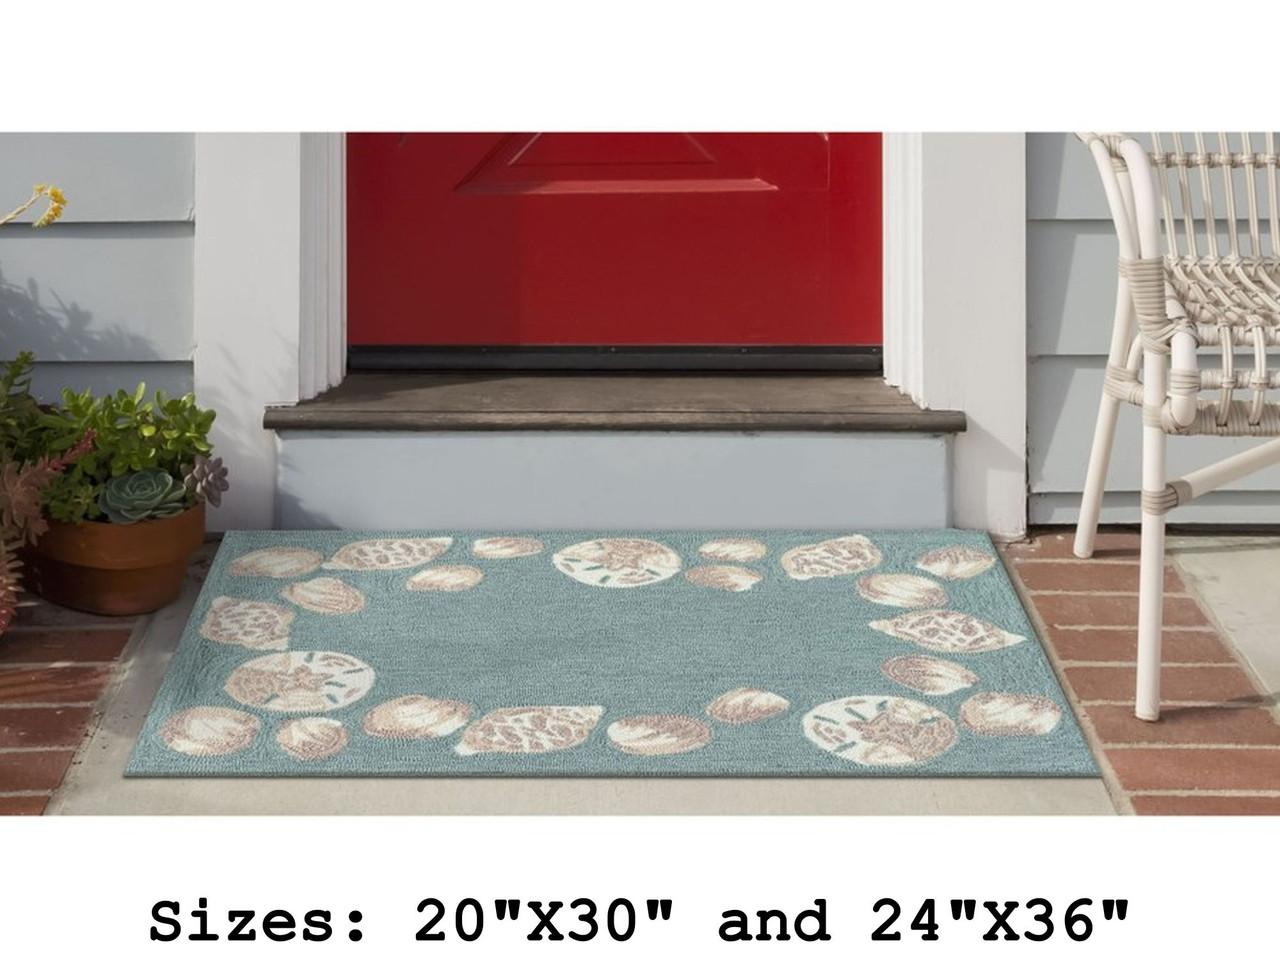 Aqua Capri Seashell Border Indoor/Outdoor Rug - Small Rectangle Lifestyle